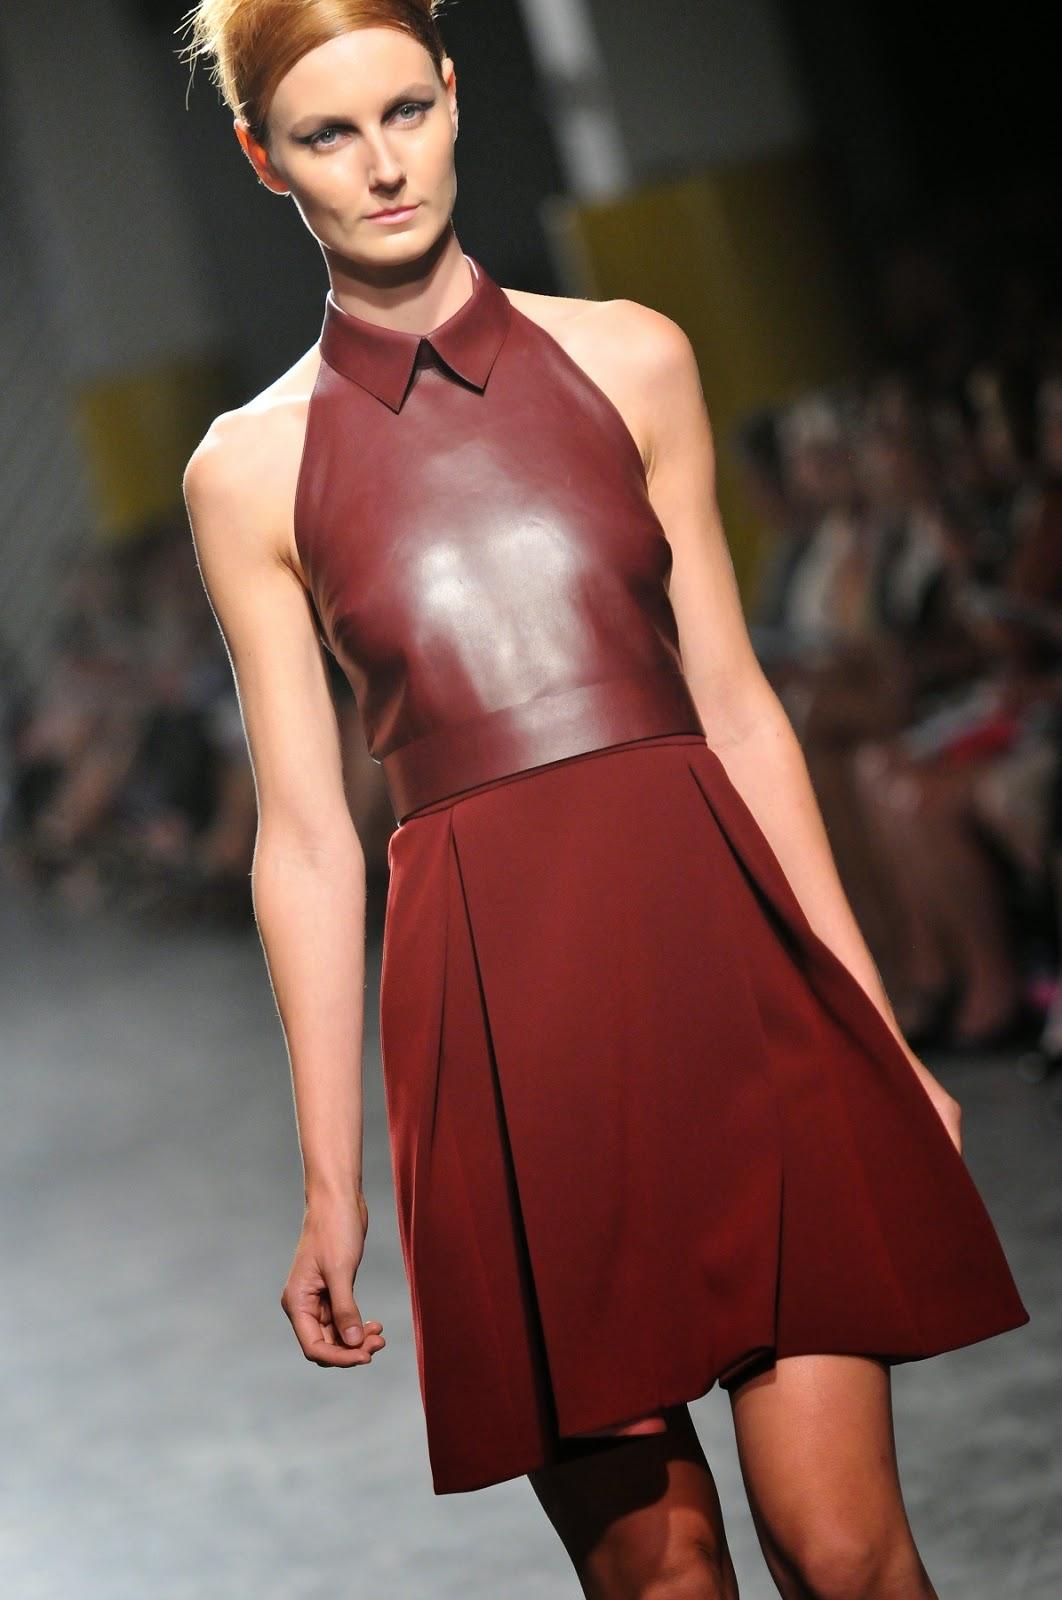 Nordstrom+Designer+Preview+2014+-+Photo+by+Vivian+Hsu-2.JPG